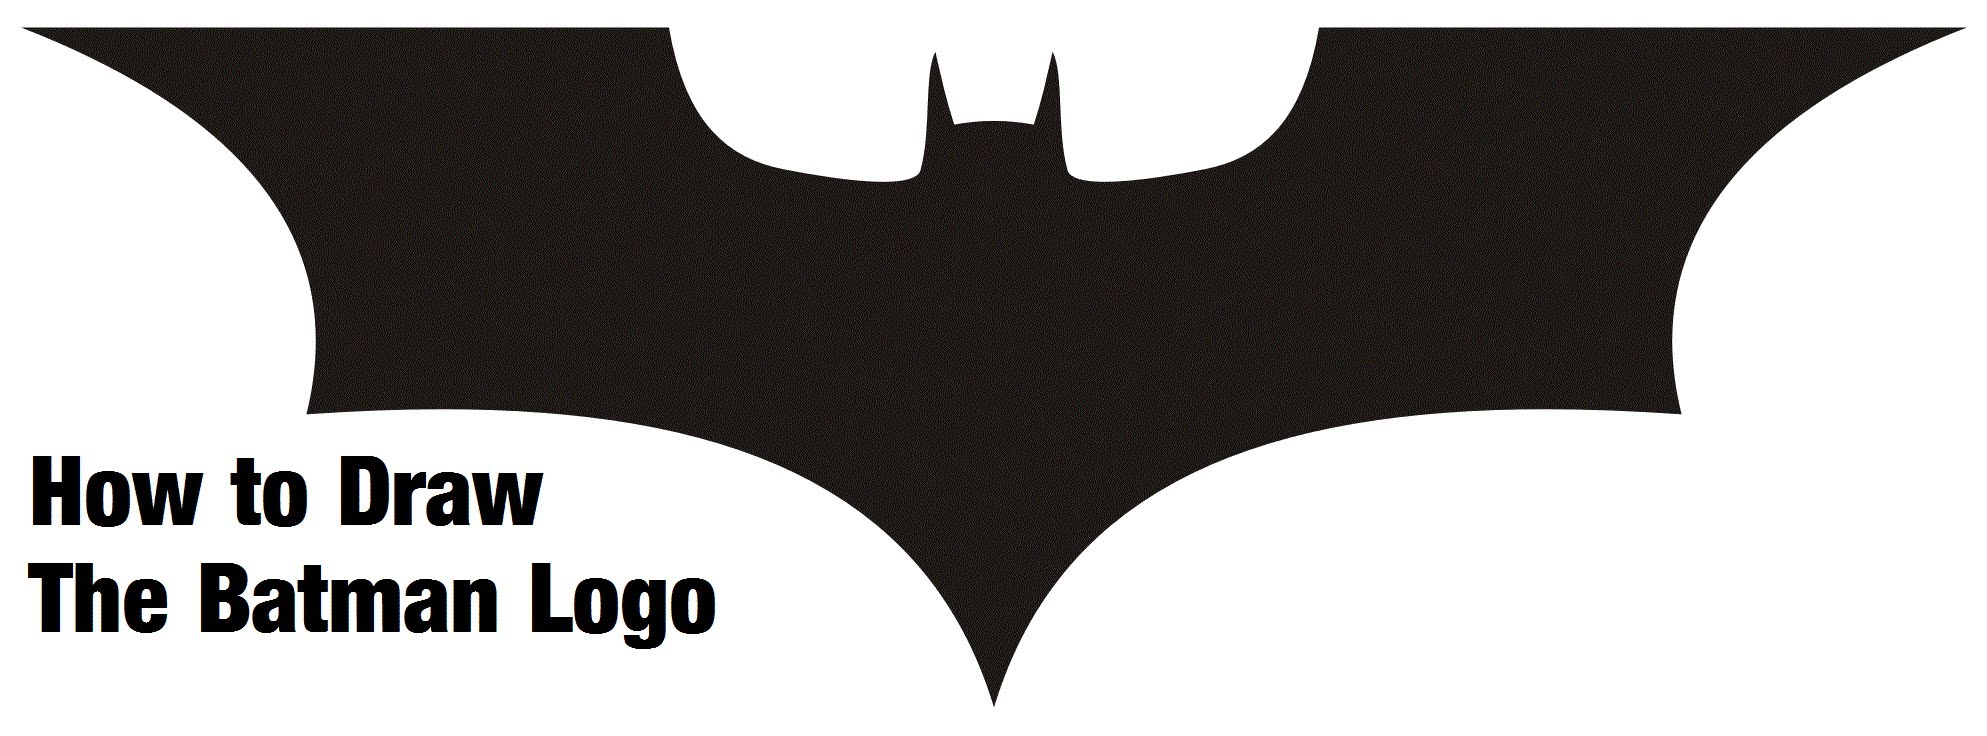 How To Draw Batman Logos